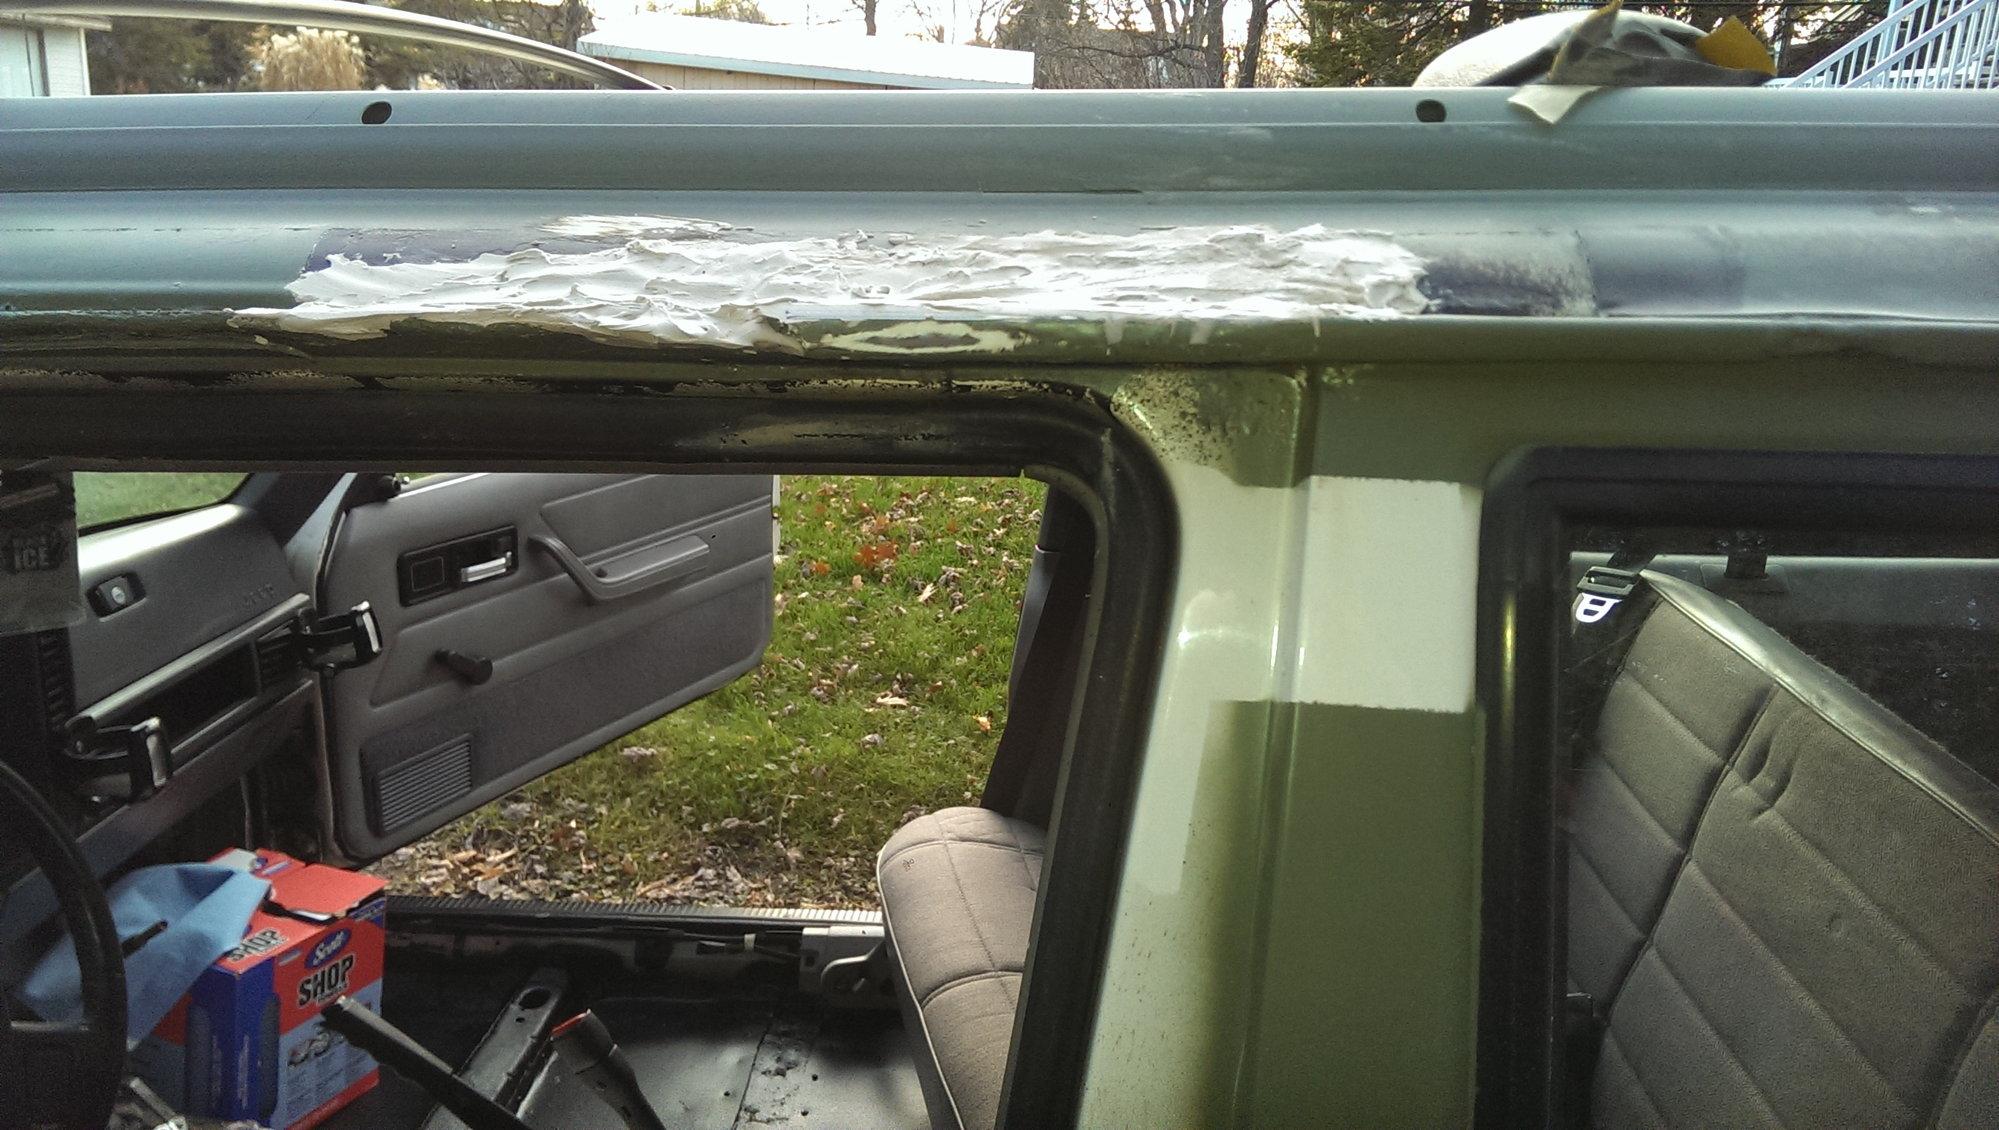 upgrade obd1 to obd2 ? - Jeep Cherokee Forum